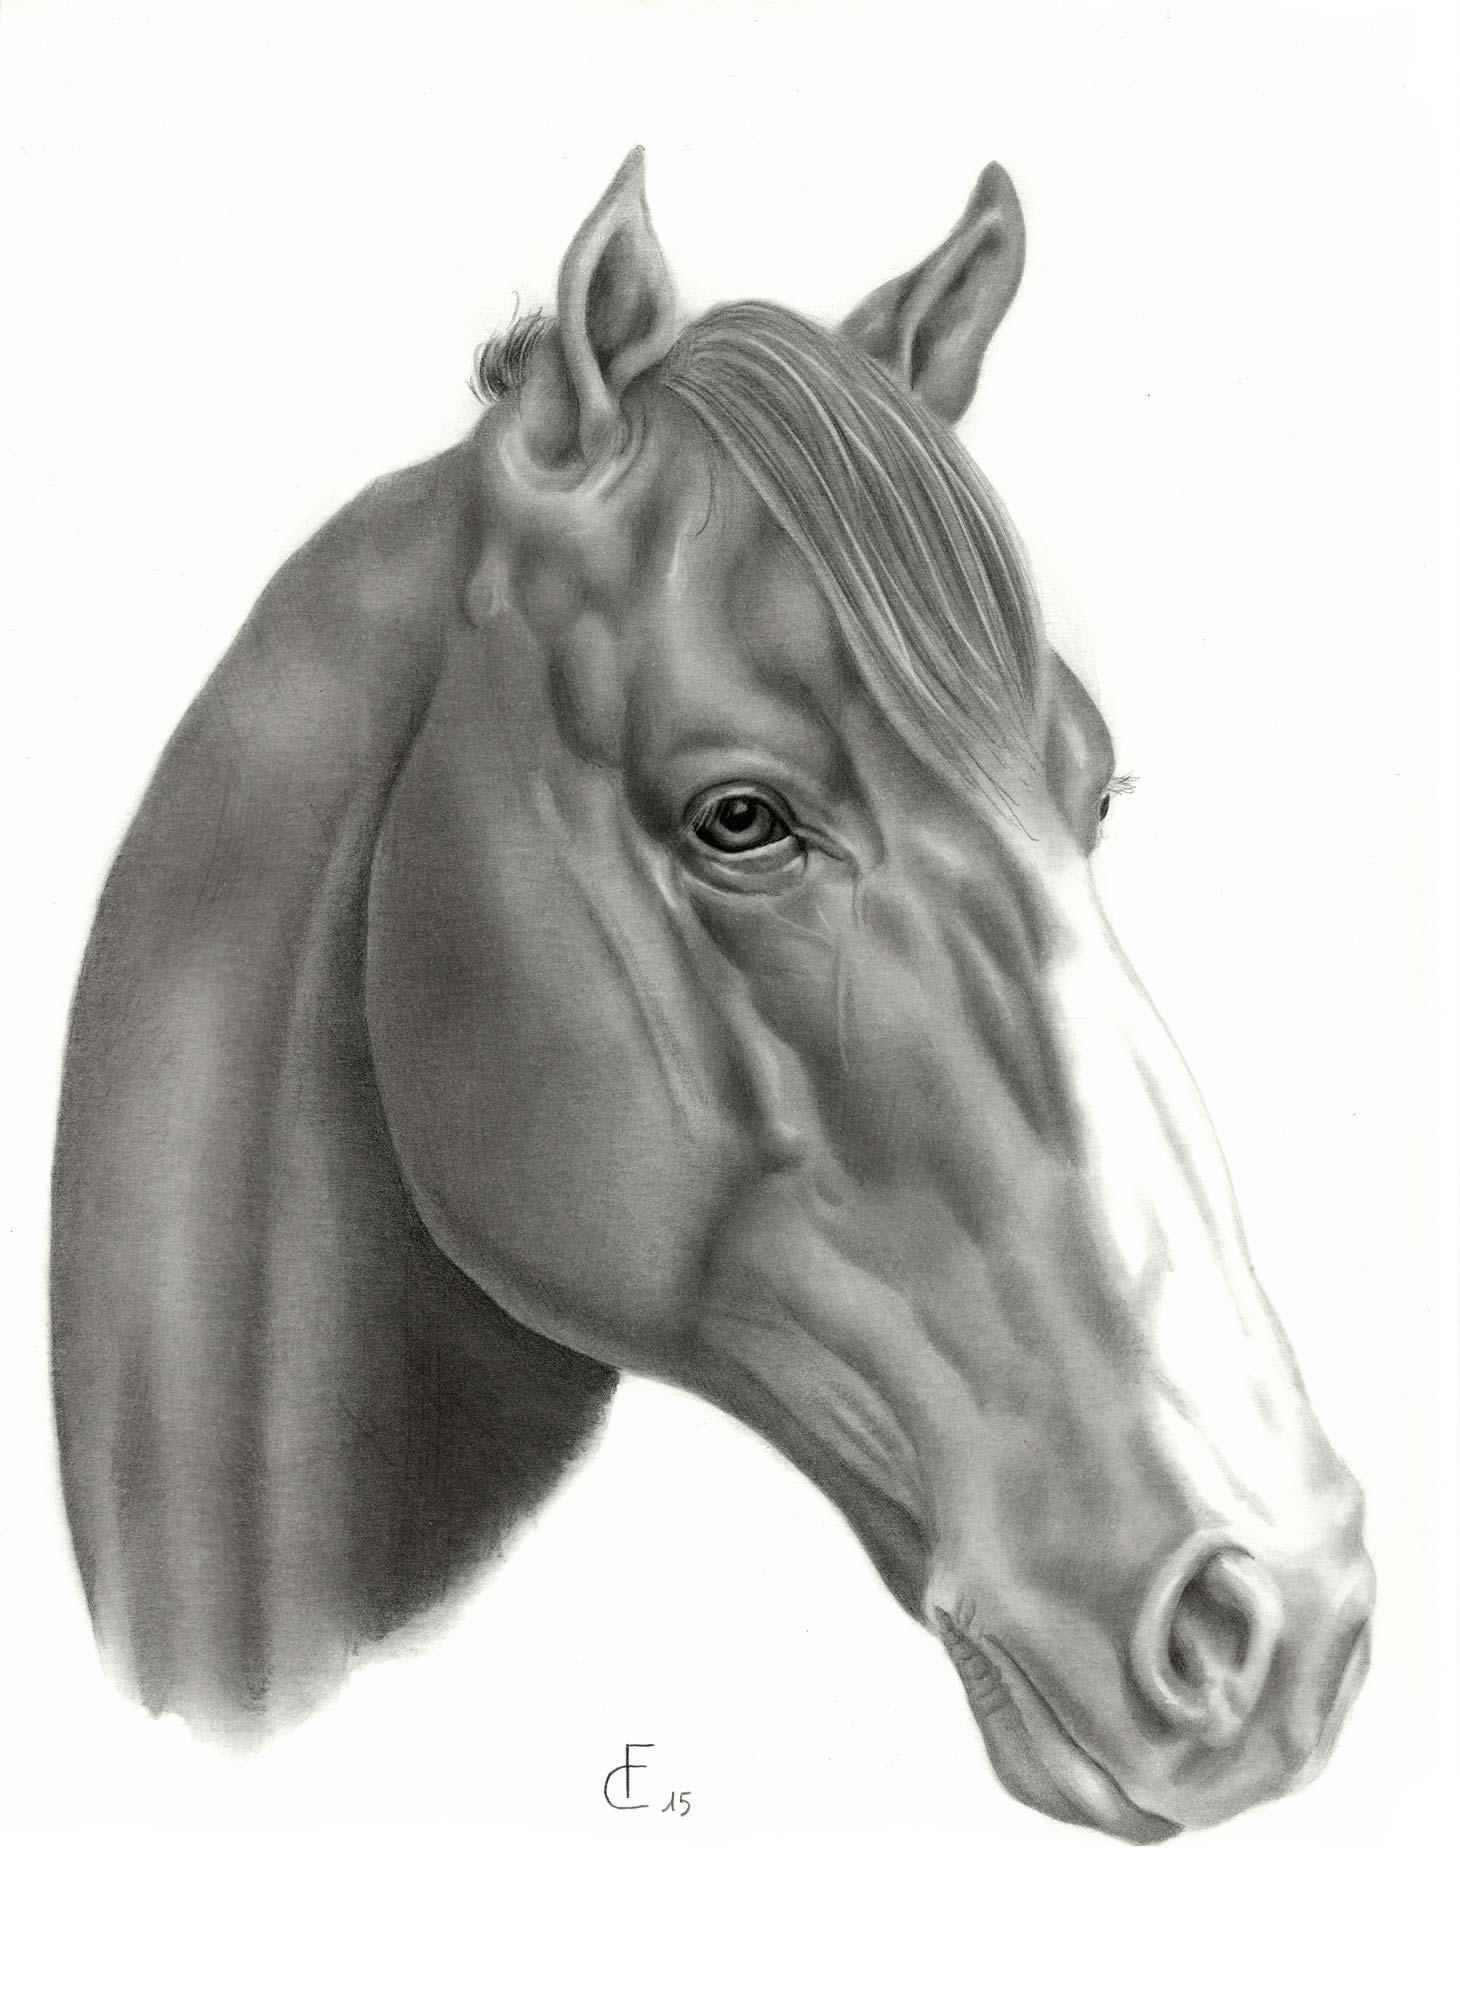 disegni di cavalli a matita kx94 regardsdefemmes ForDisegni Di Cavalli A Matita